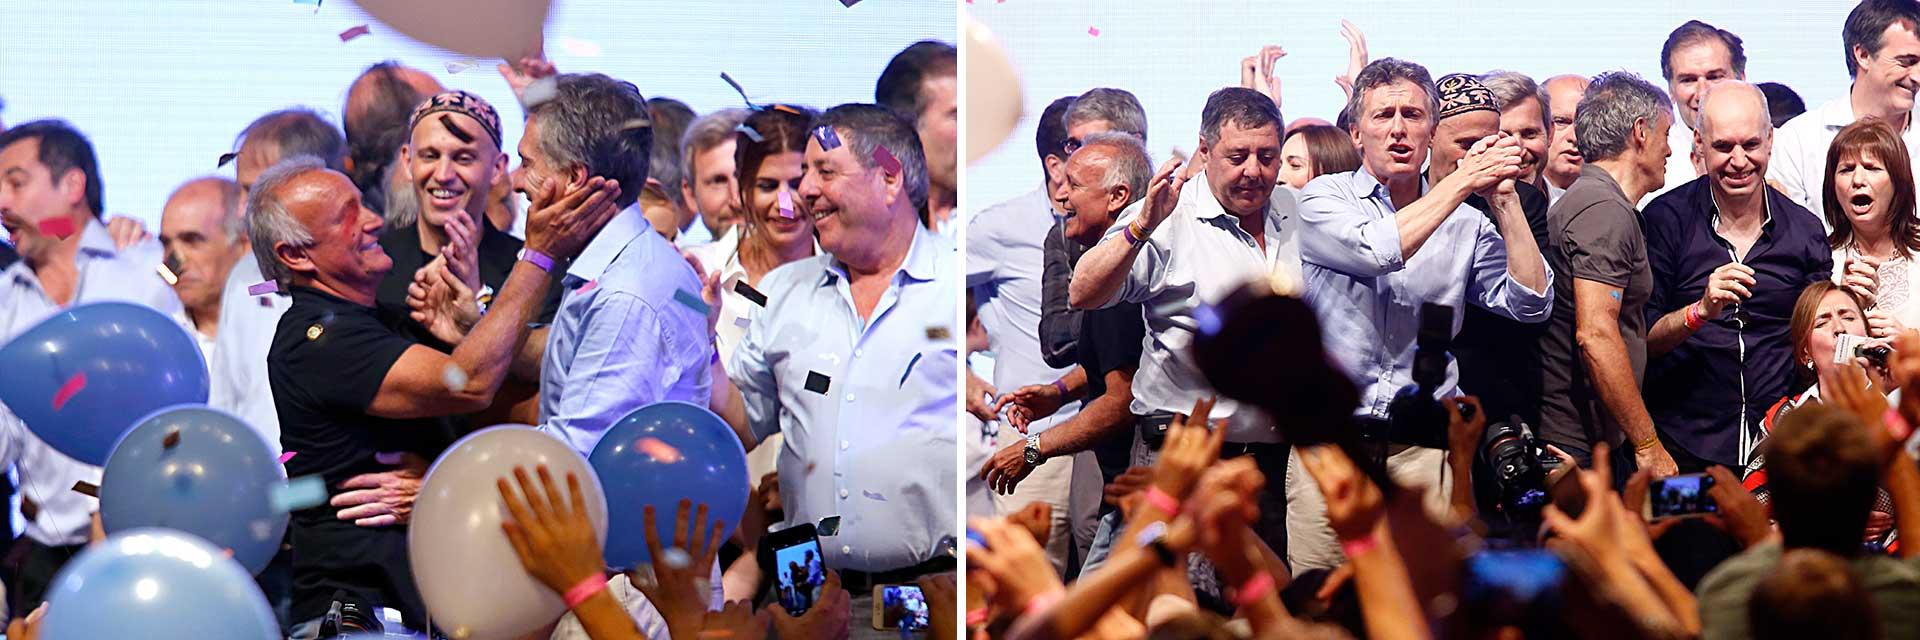 Macri_bunker_ballotage_2_caja